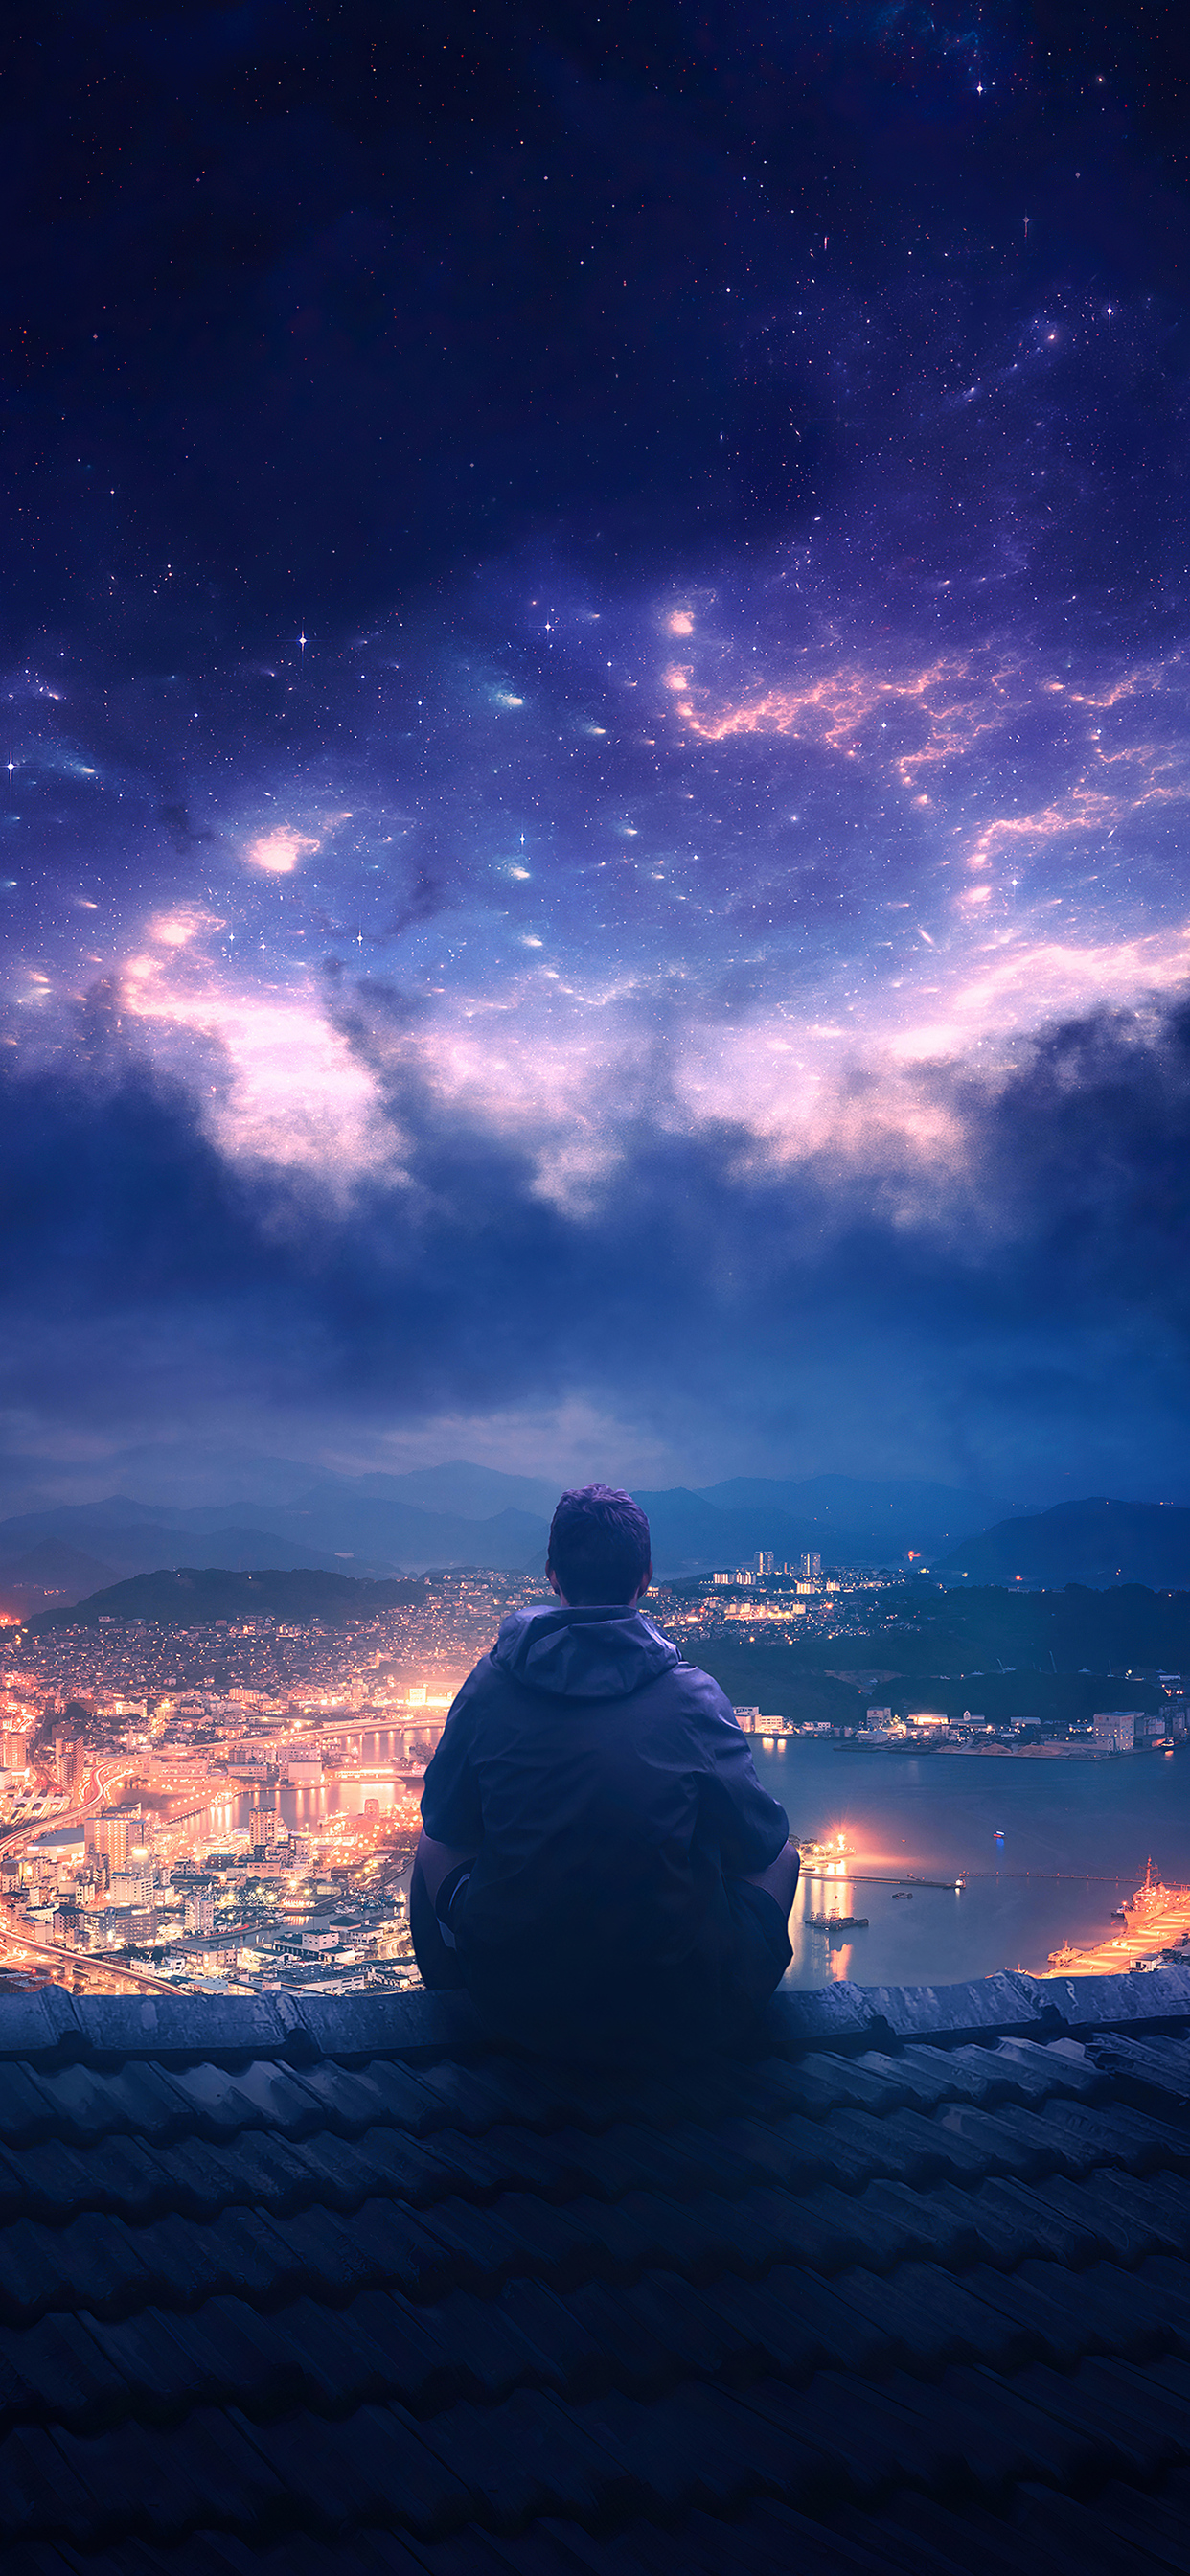 distant-dream-ku.jpg